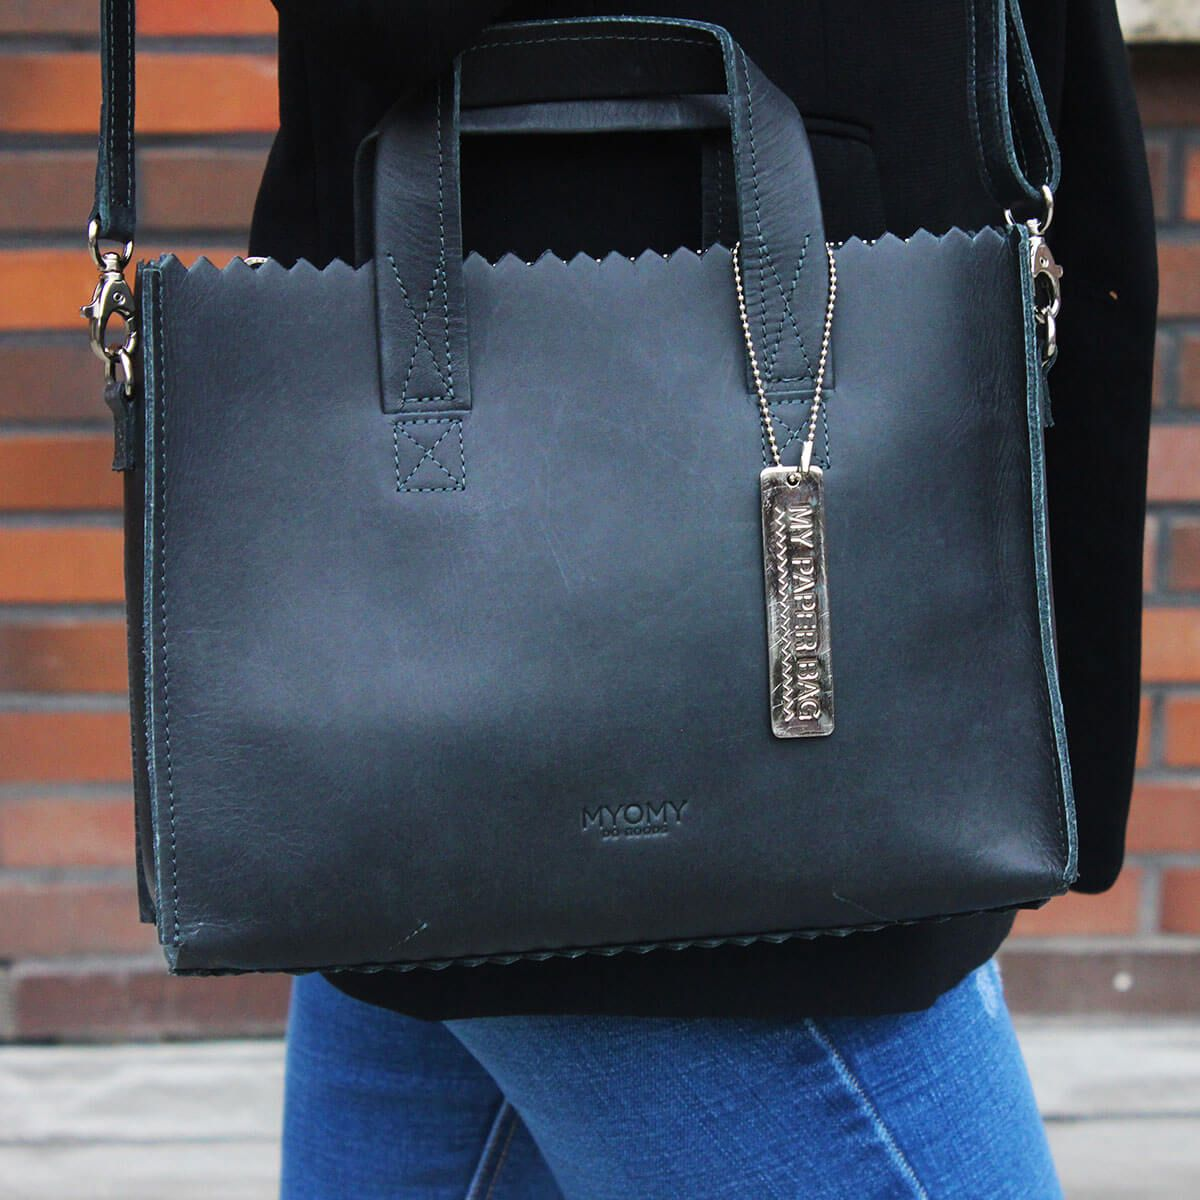 7d8ecc23c5e Schoudertas | Shoulderbag | Leren tas | Leer | Leather bag | Leather |  MYOMY